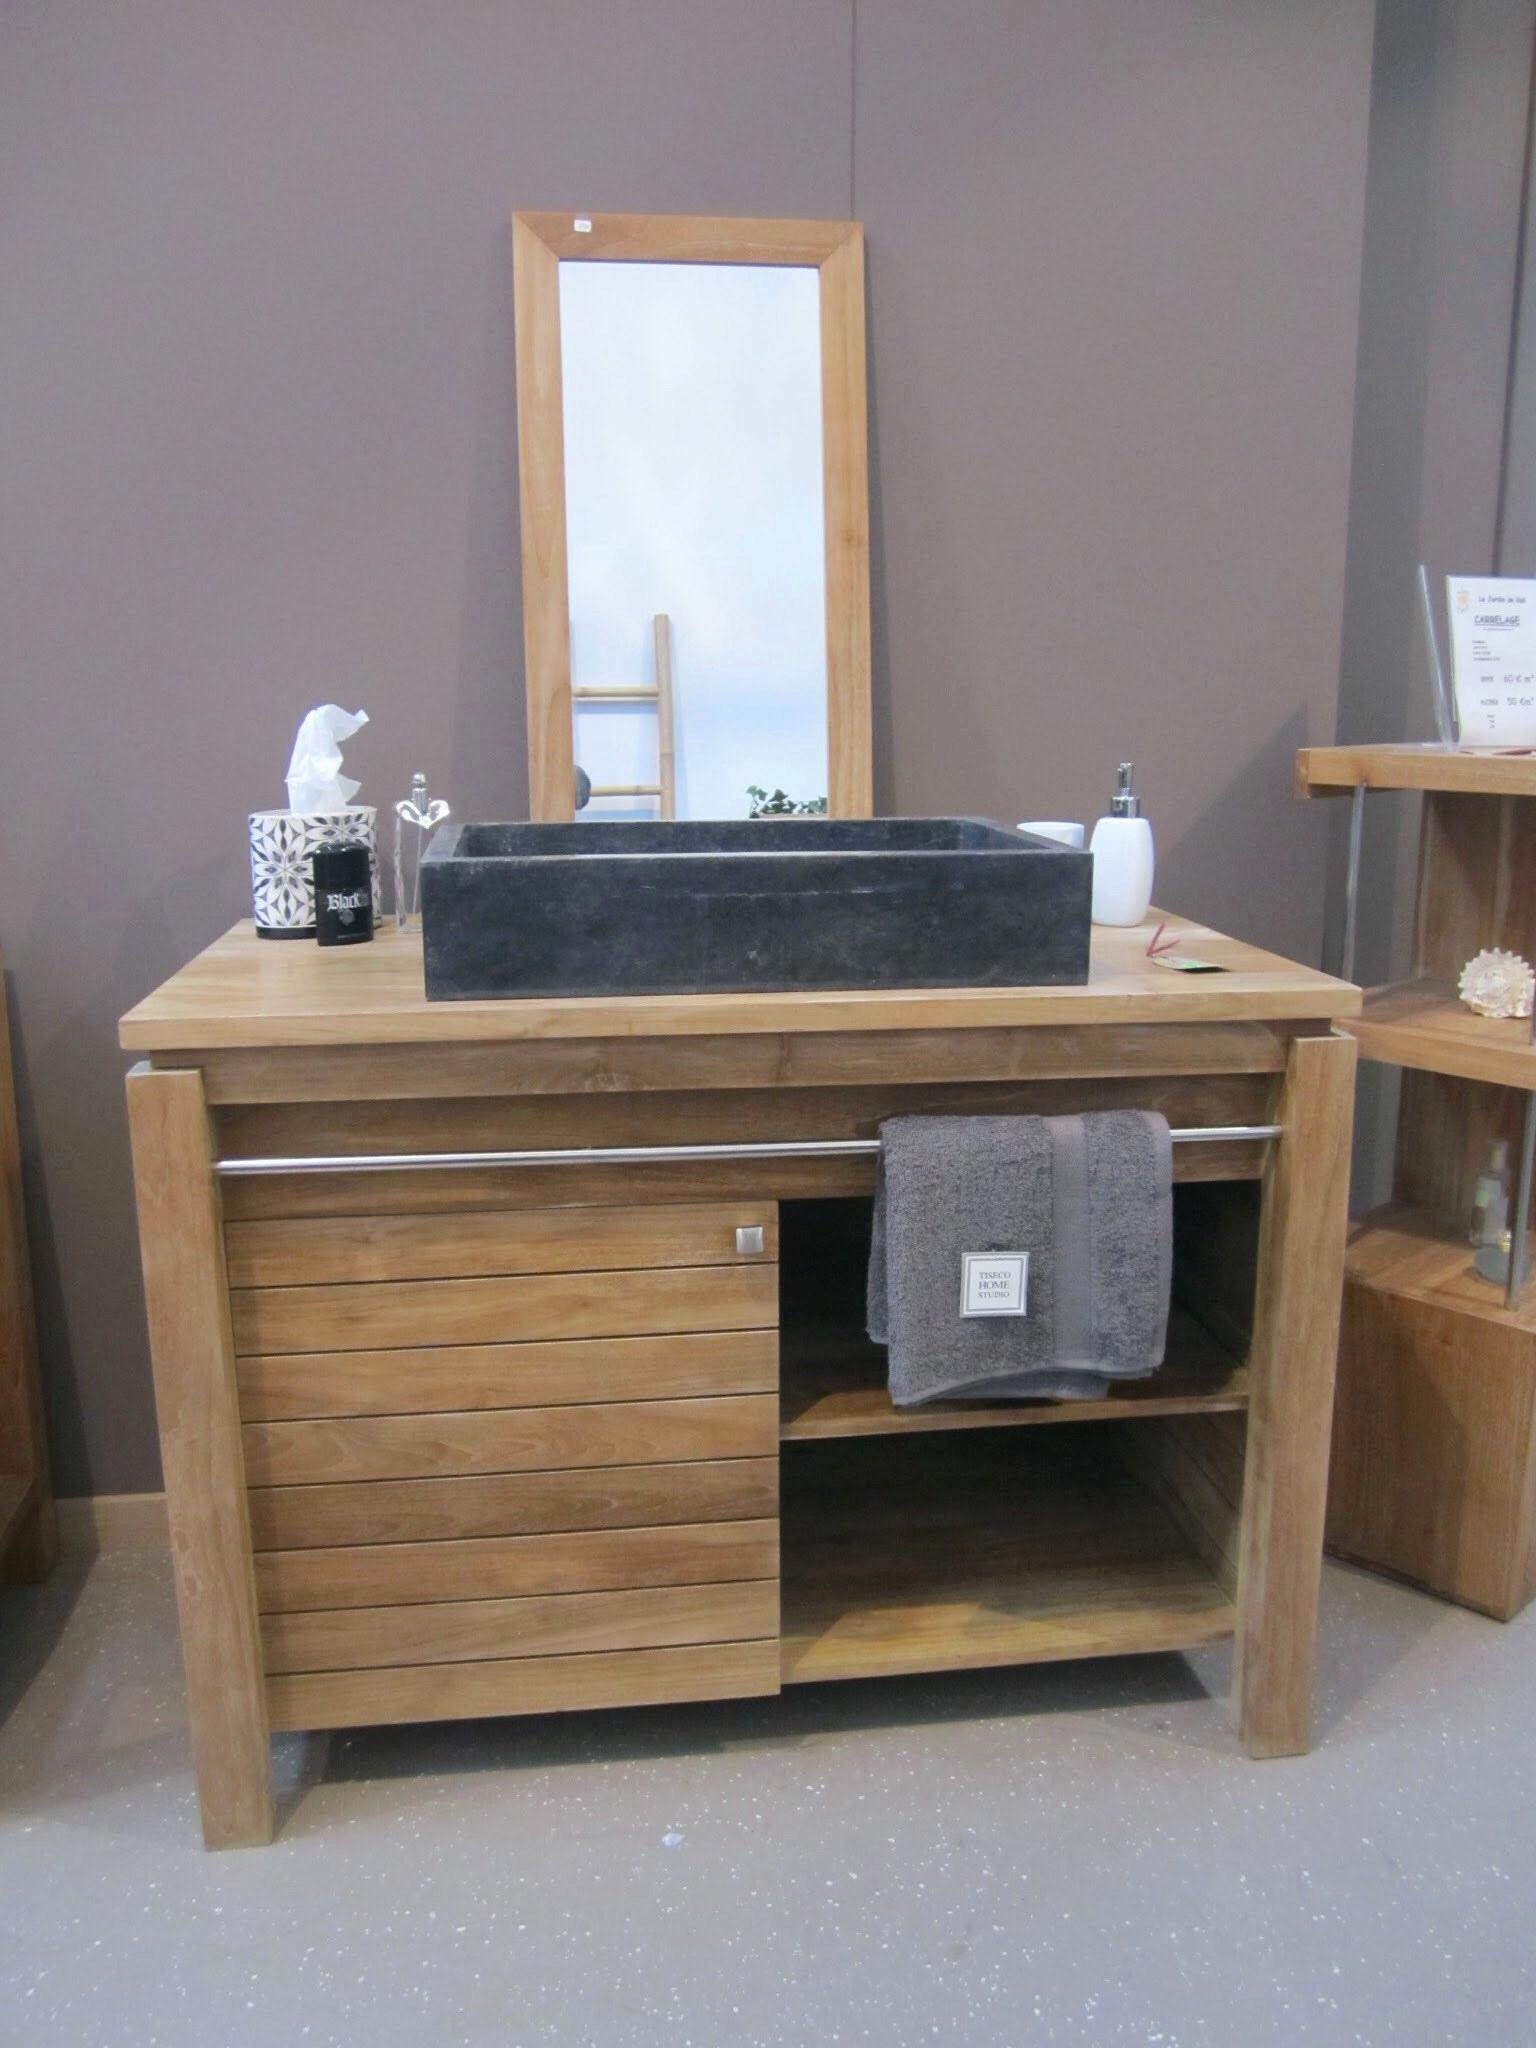 dressing brico leclerc inspire meuble bas salle de bain brico depot log wall of dressing brico leclerc